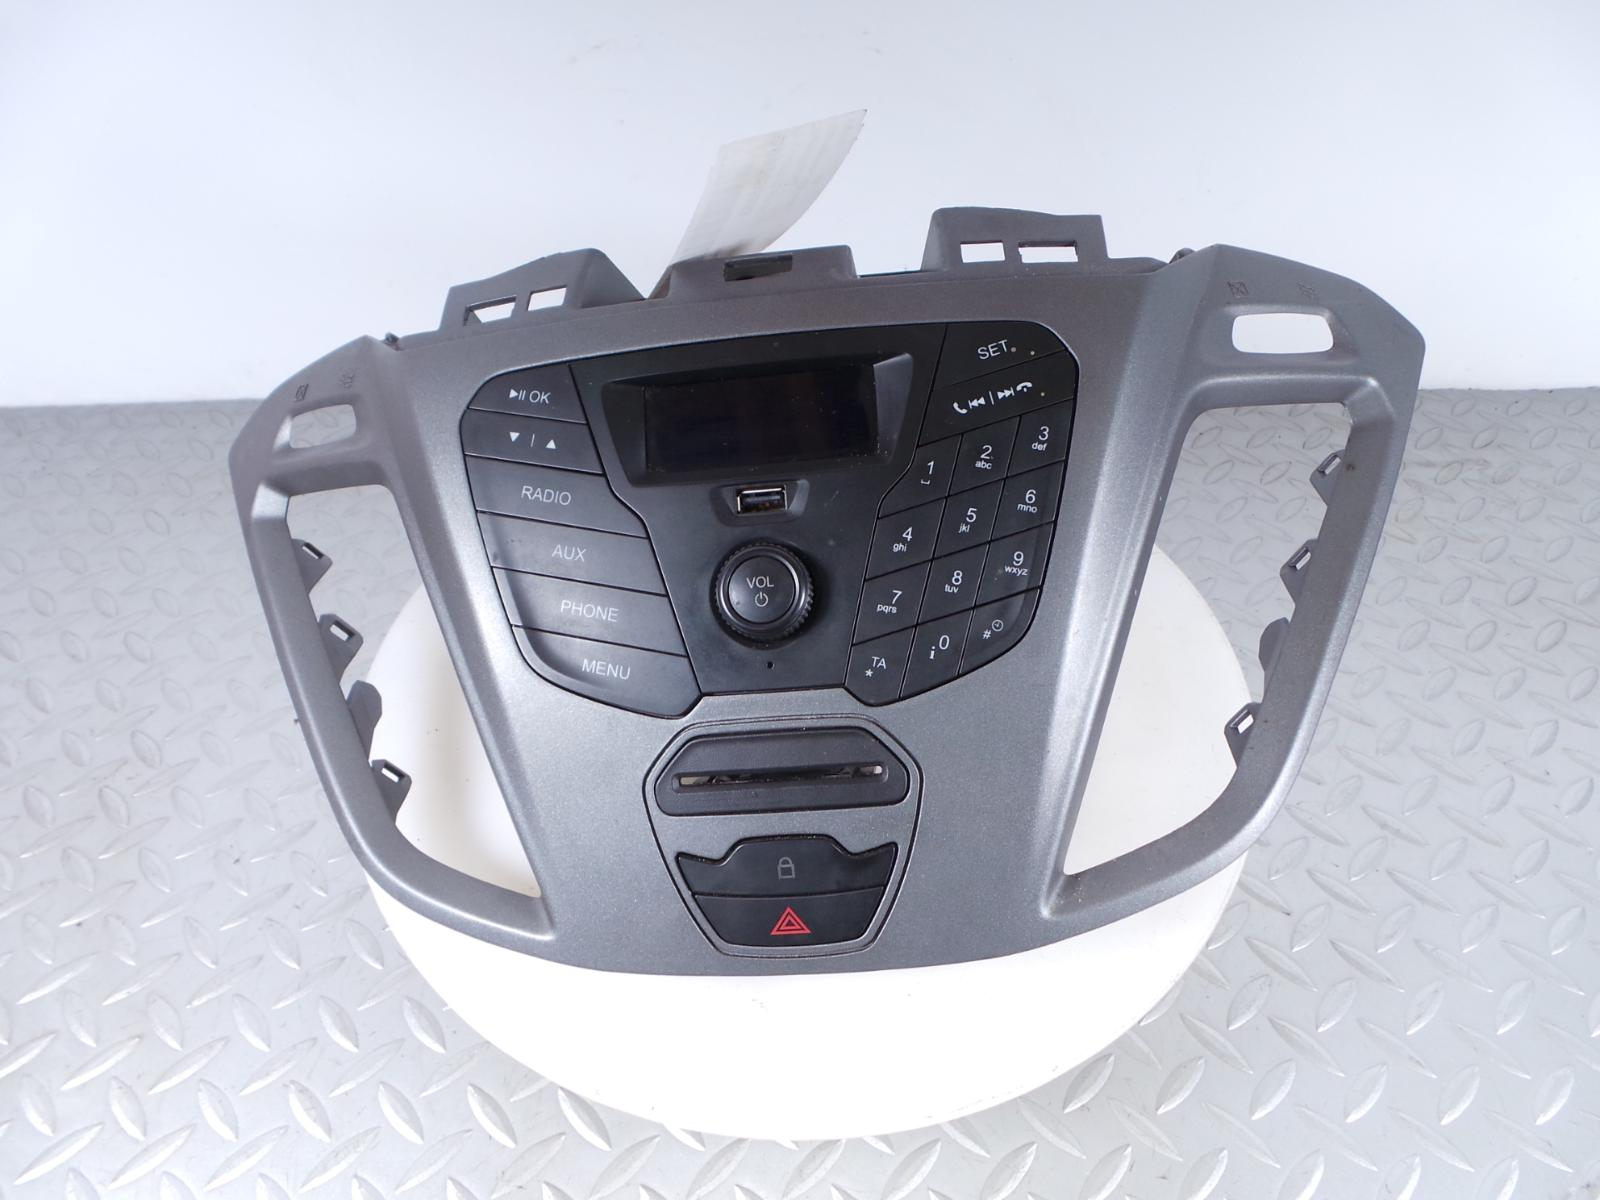 2014 ford transit custom cd player radio display bk2t. Black Bedroom Furniture Sets. Home Design Ideas